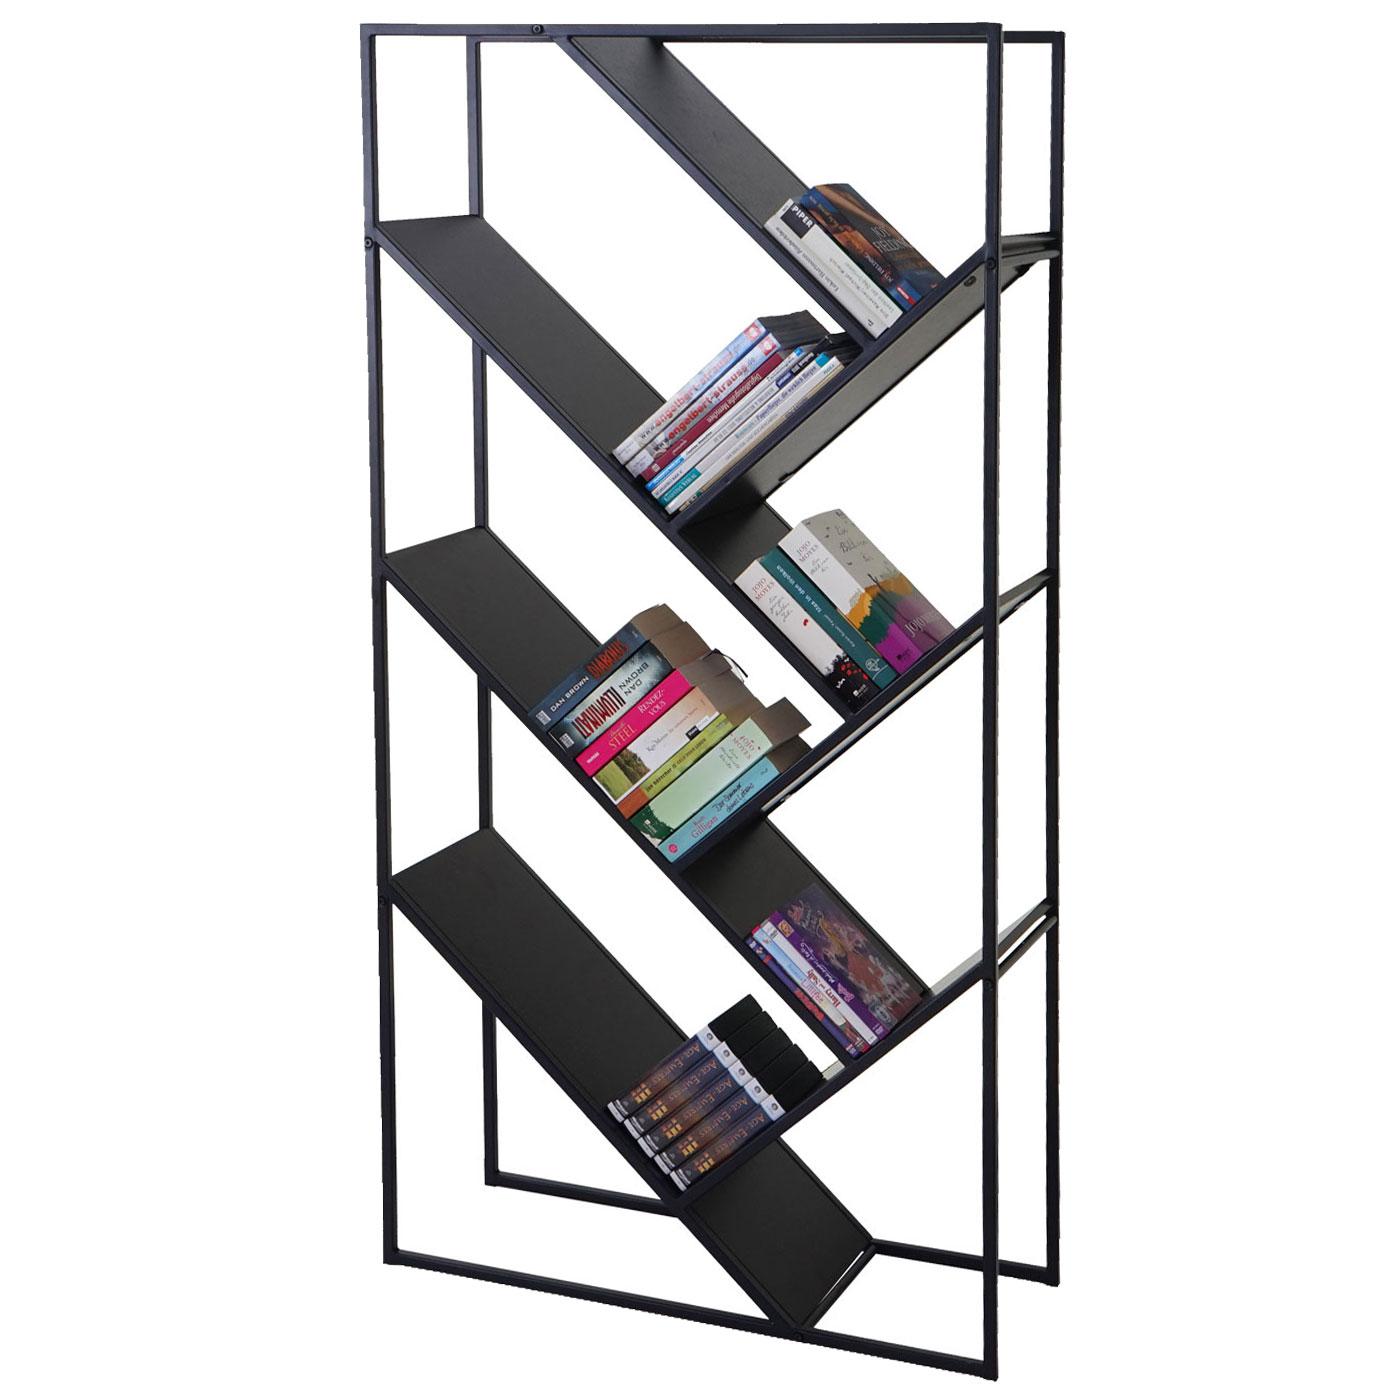 b cherregal standregal wohnregal 160x80cm 4 ebenen. Black Bedroom Furniture Sets. Home Design Ideas